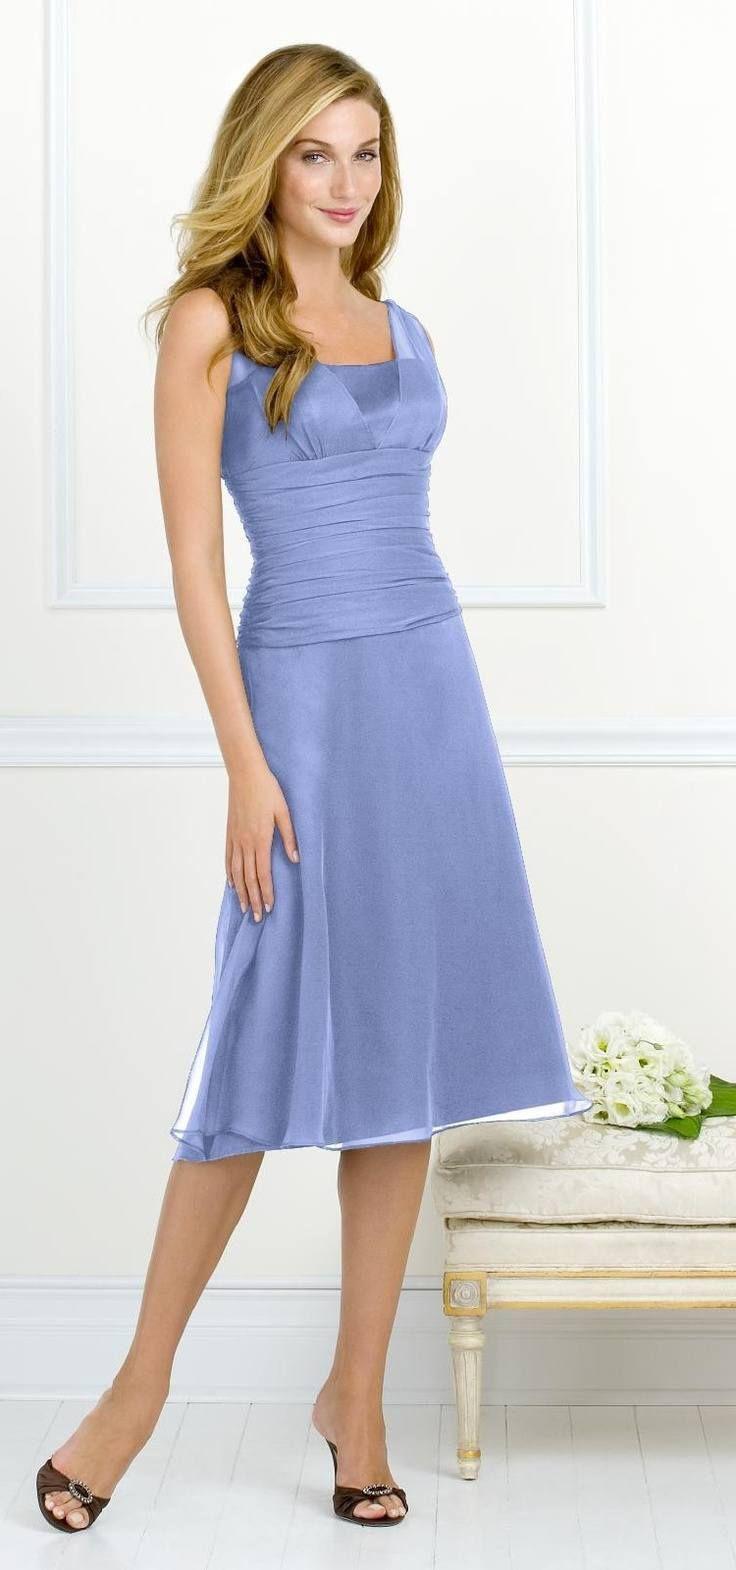 86 best wedding dresses images on pinterest wedding dressses periwinkle bridesmaid dresses ombrellifo Image collections